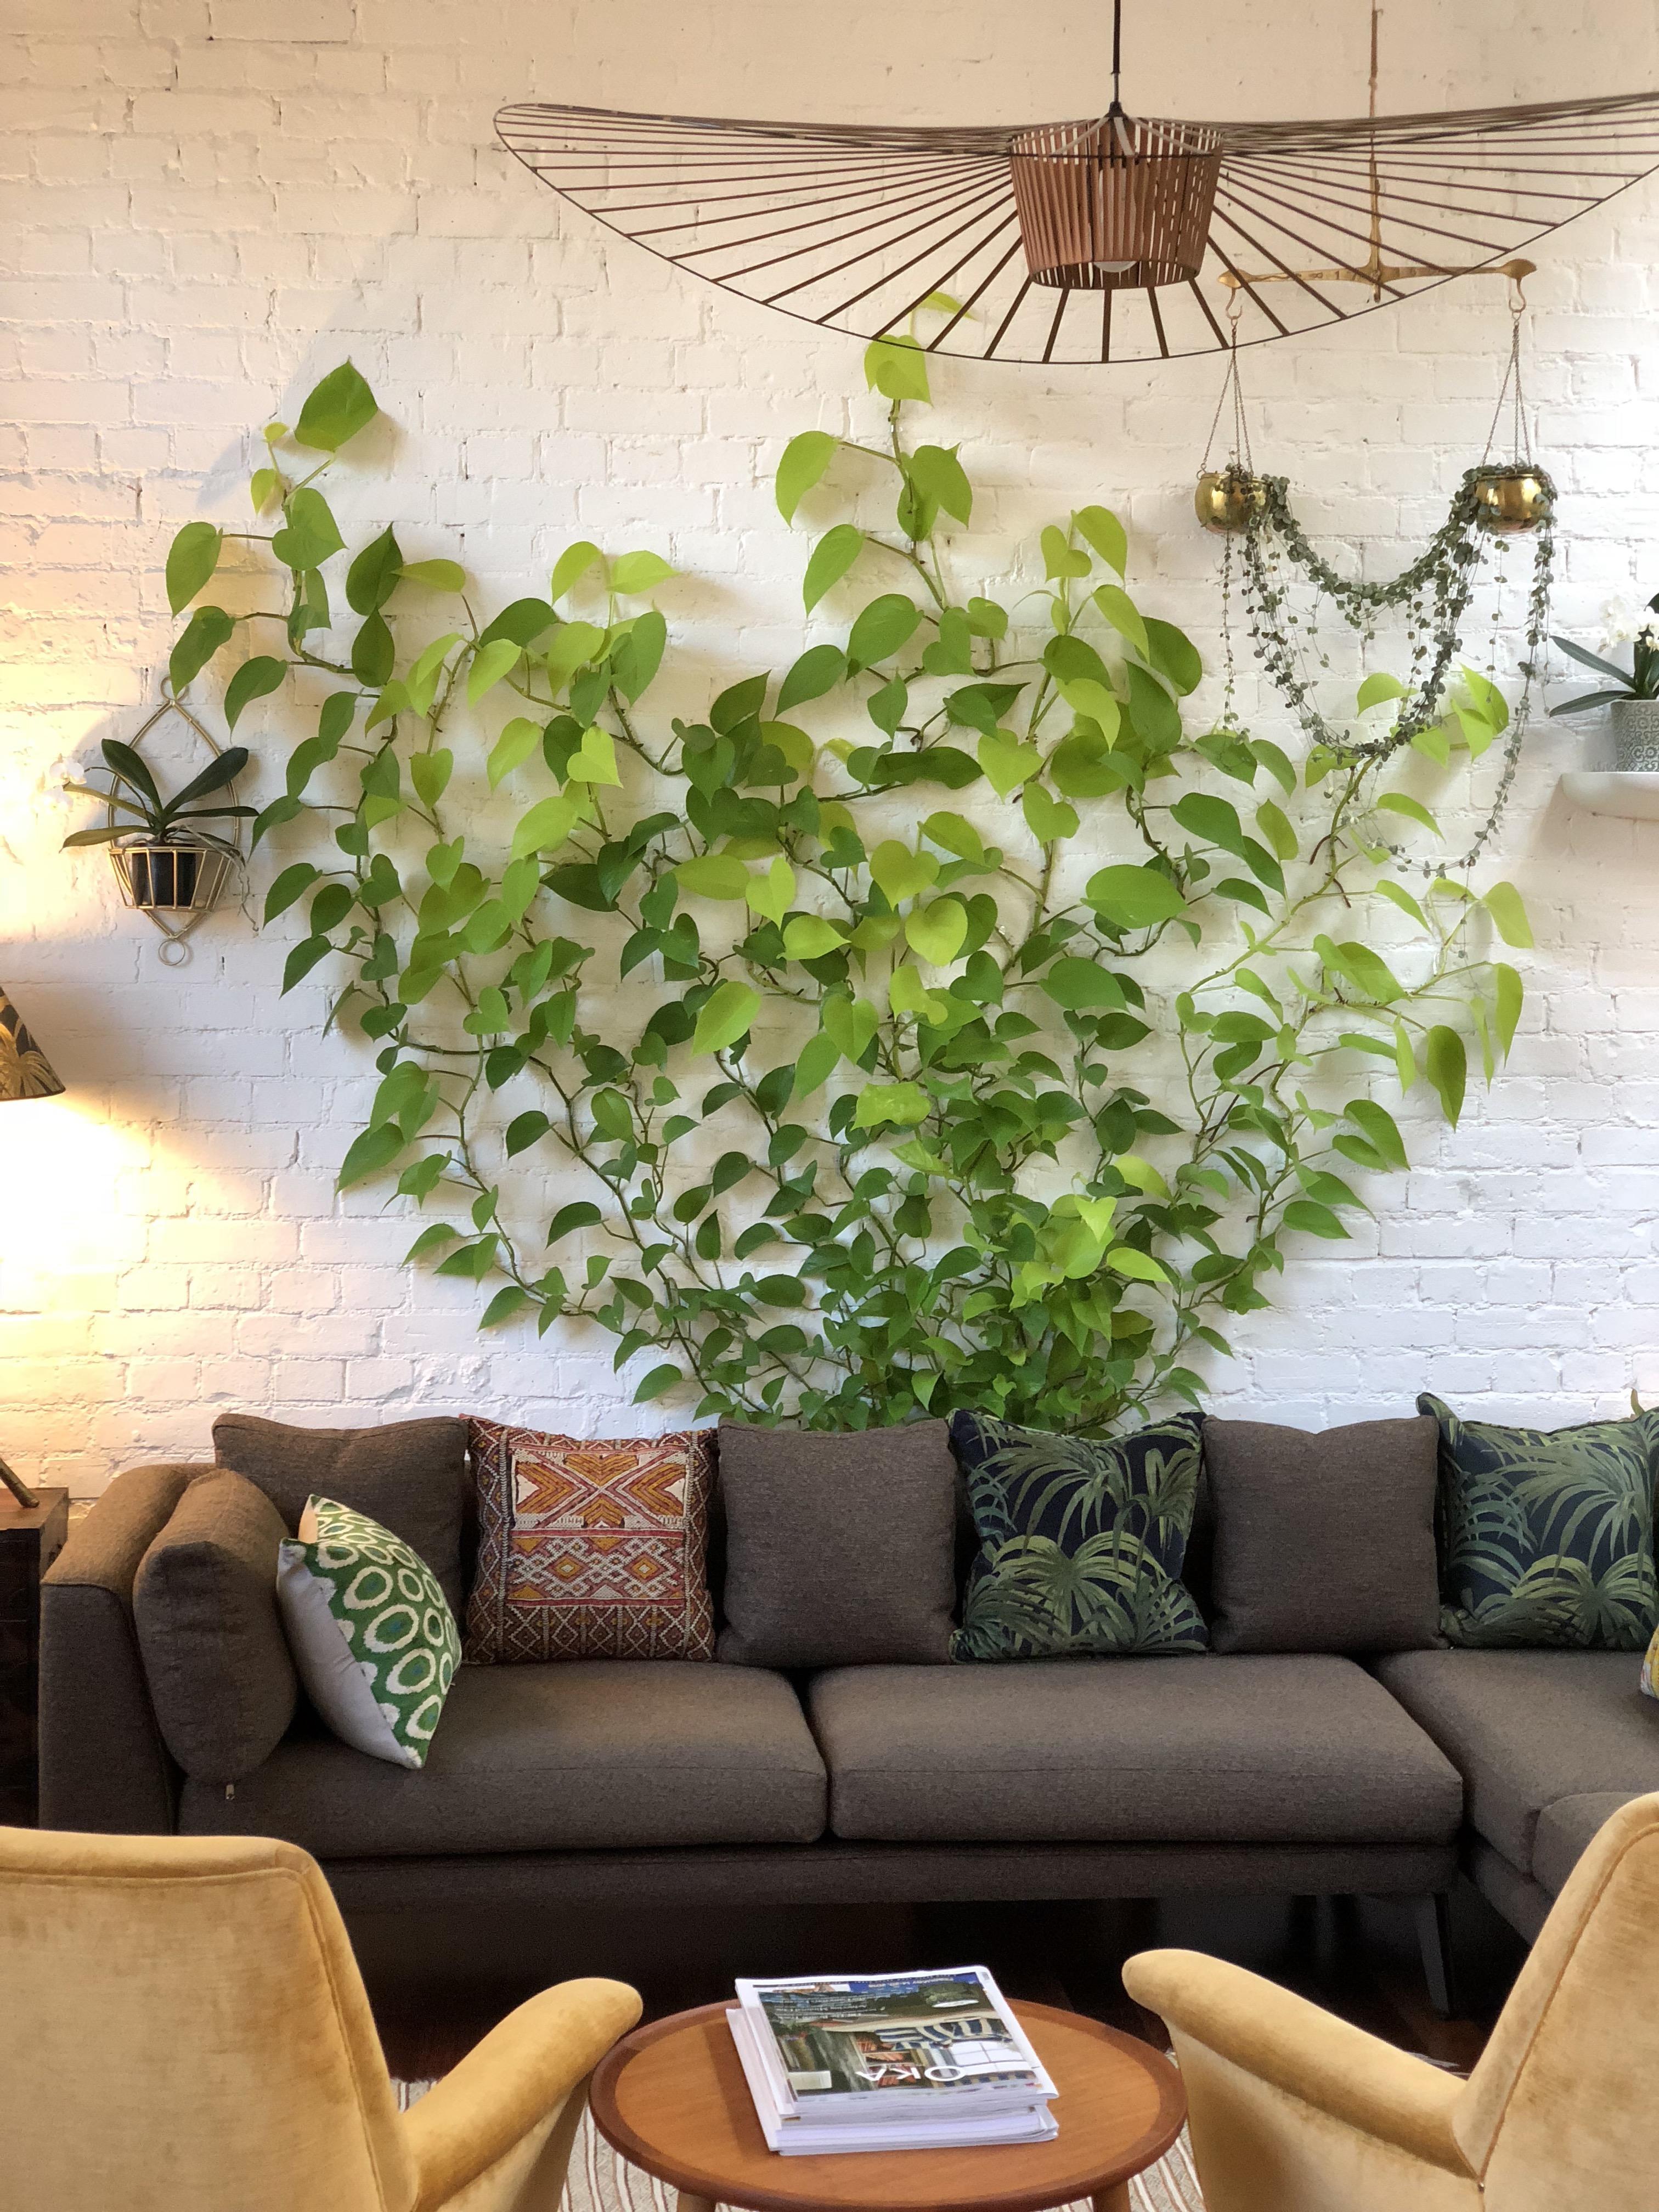 Toolbox Tutorials Turn An Easy Care Houseplant Into A Dramatic Climbing Garden 6sqft